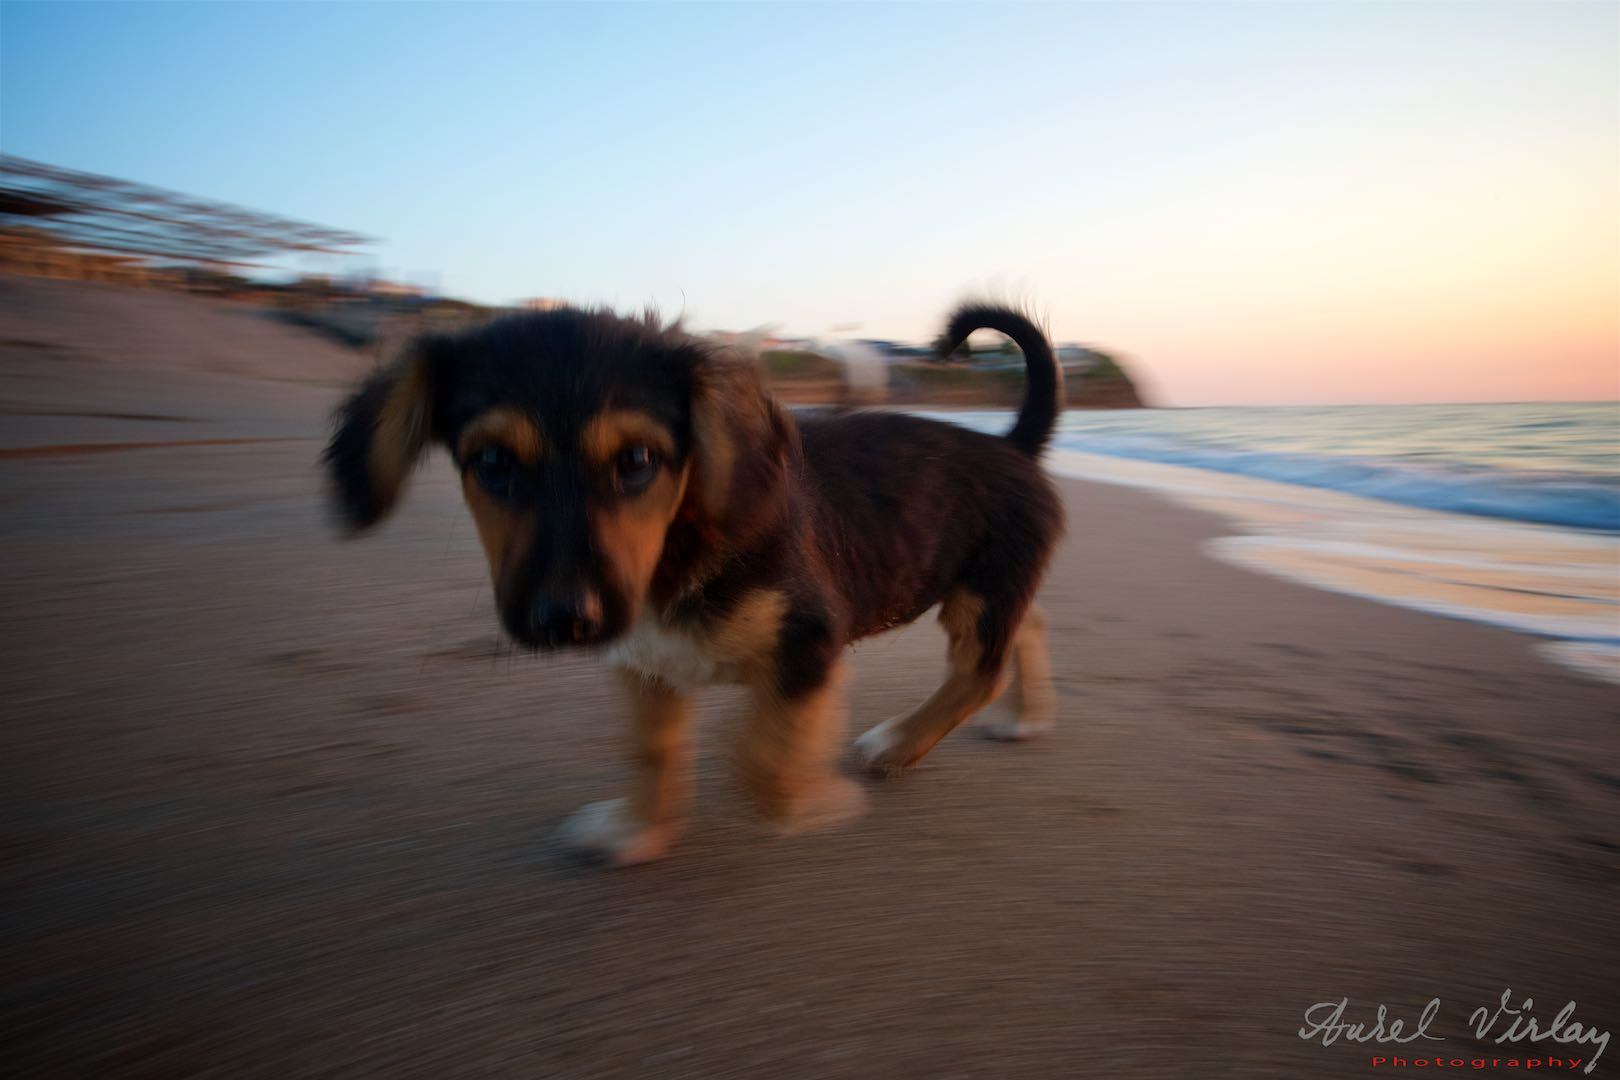 Curiosity between a doggy and a photographer.